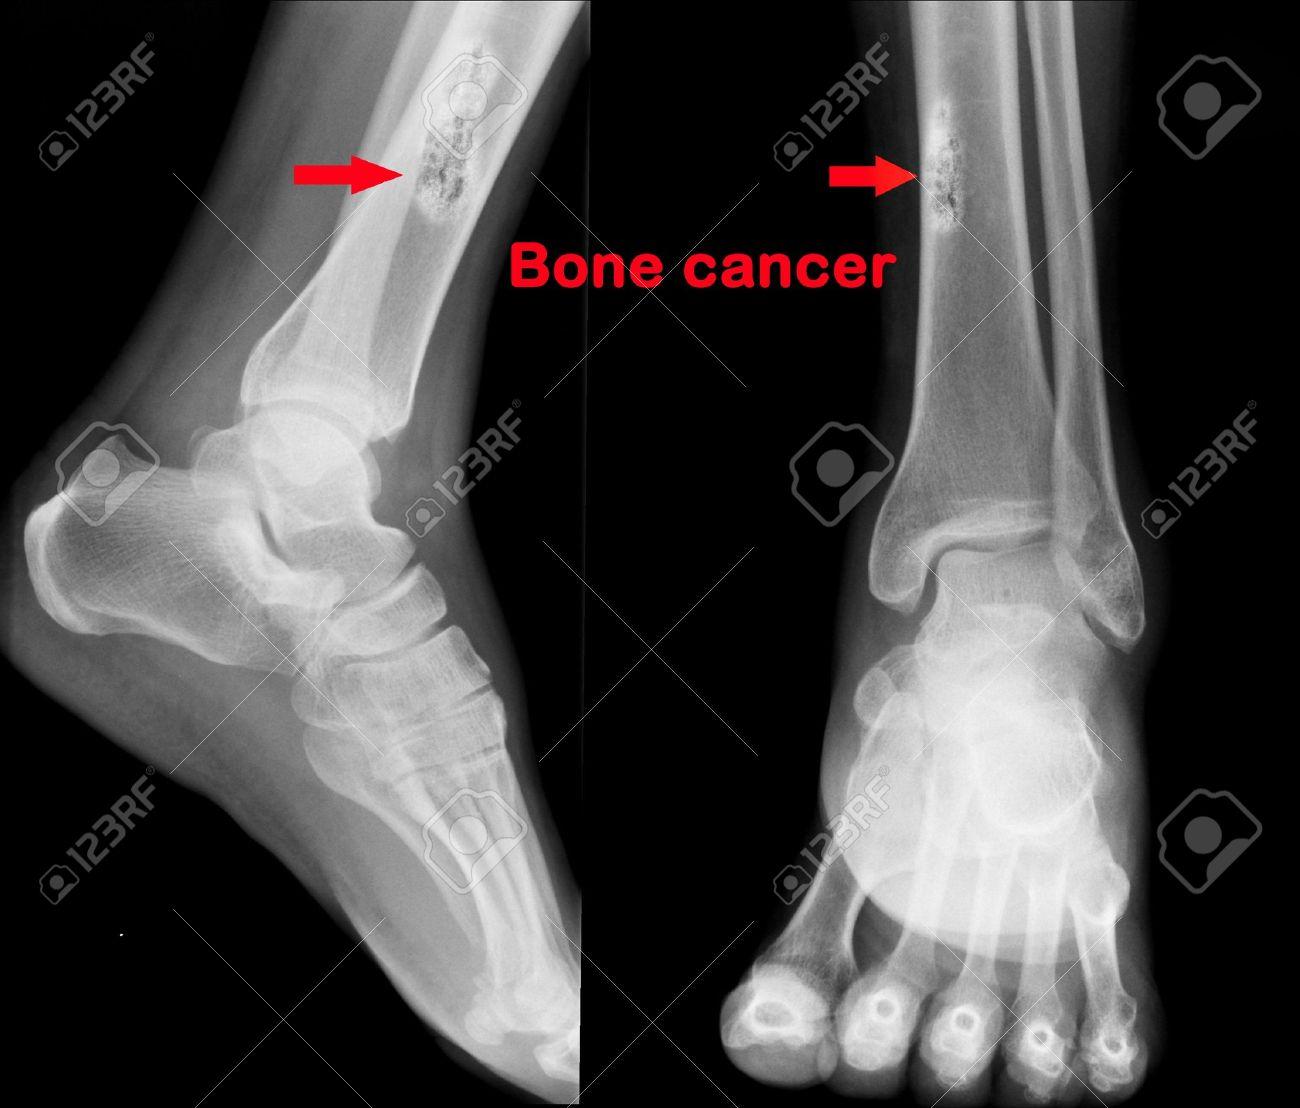 X ray de cancer des os Banque d'images - 20421460